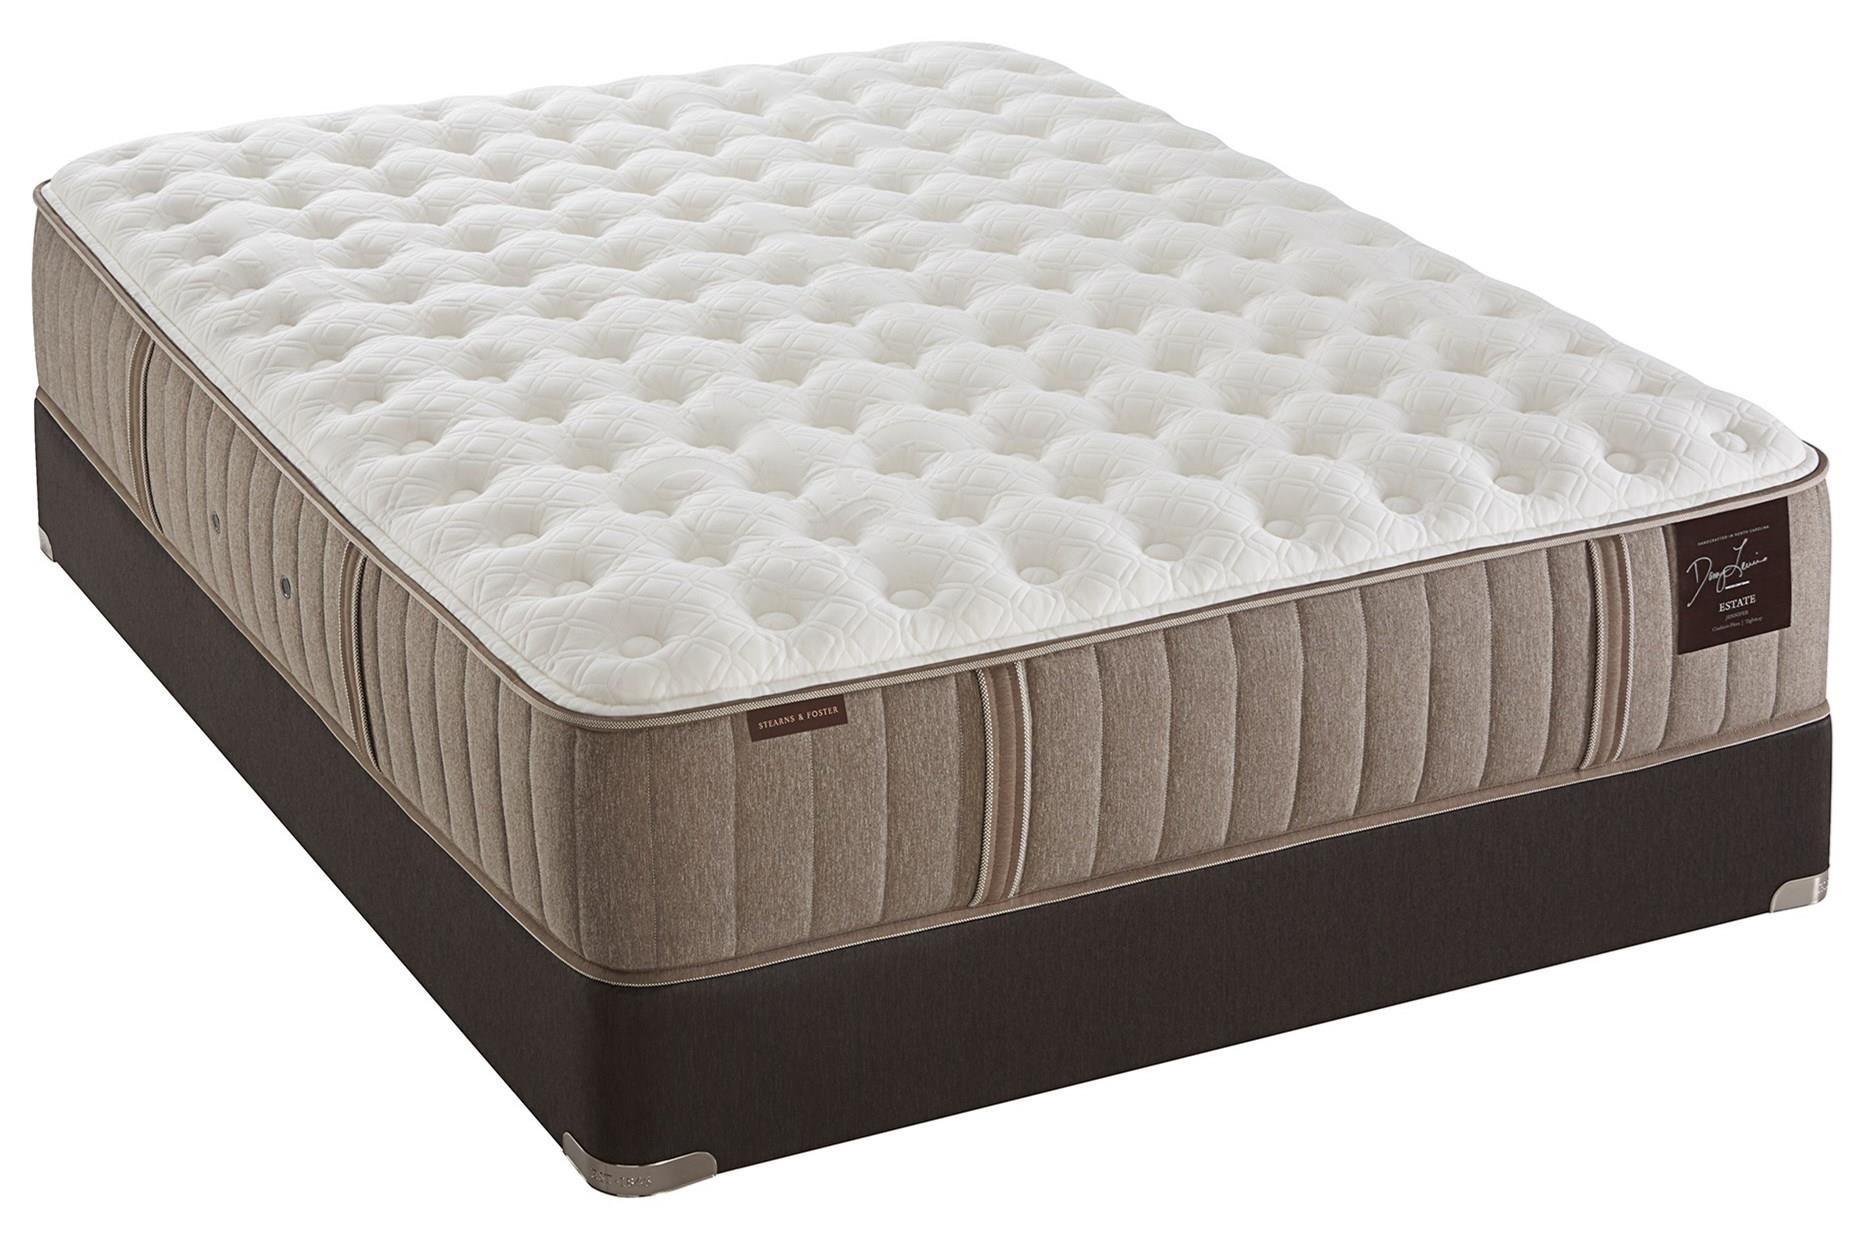 Full Cushion Firm Adjustable Set